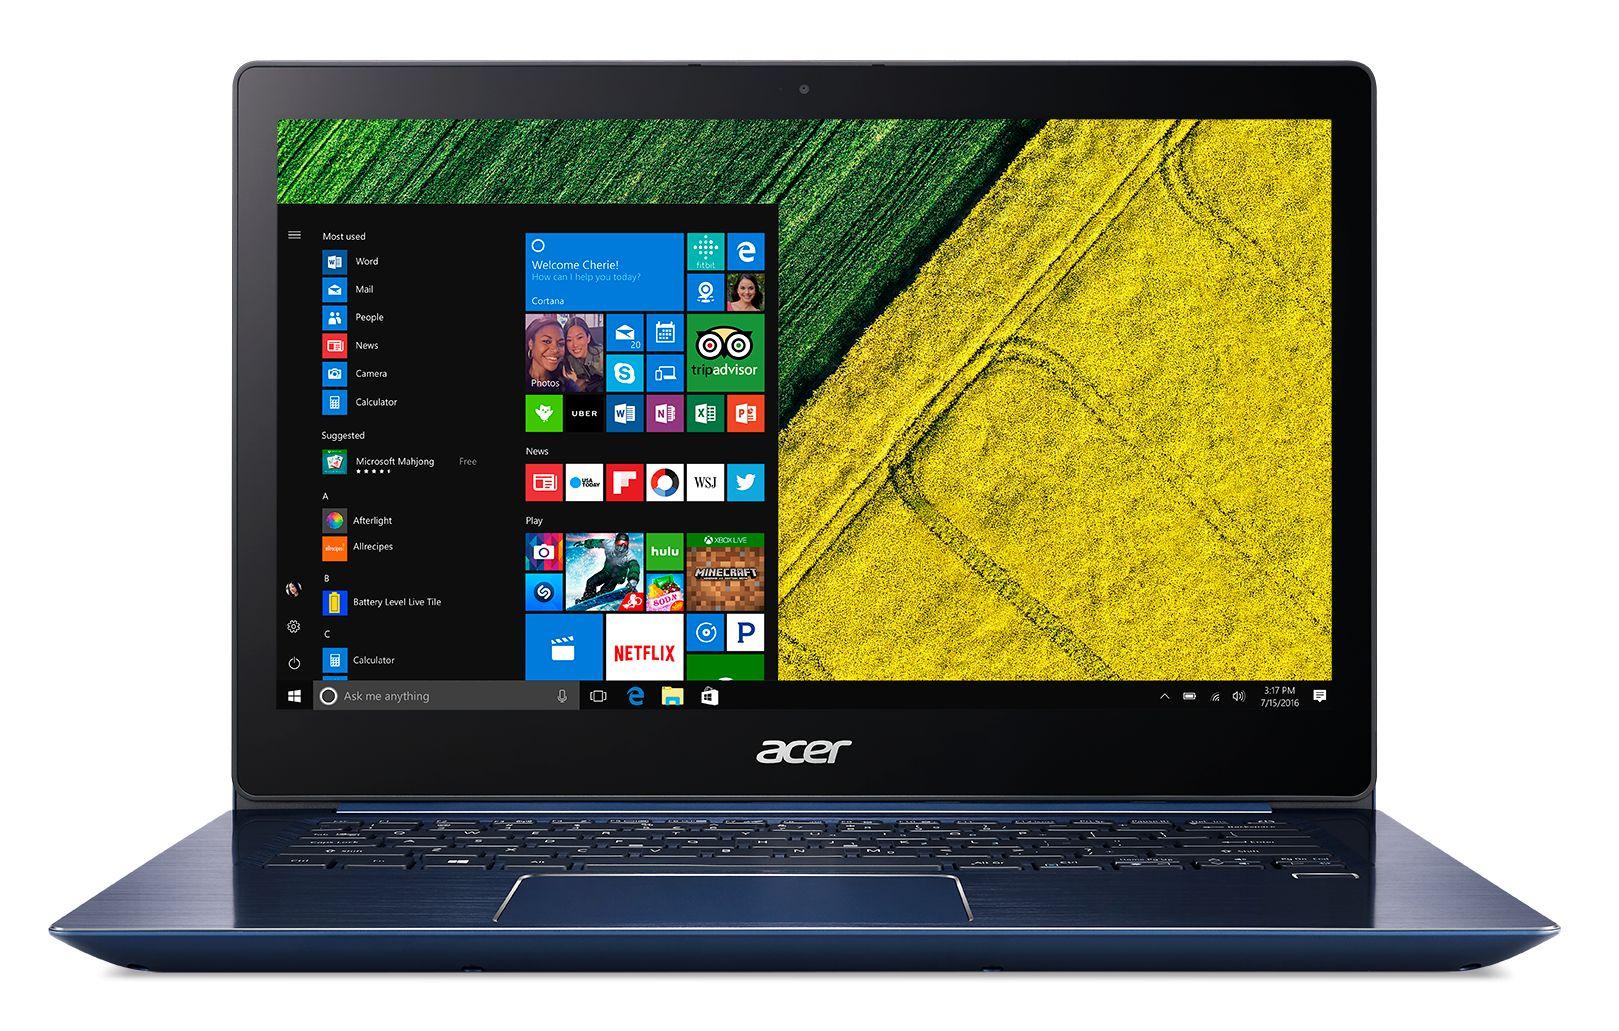 "Acer Swift 3 (SF314-52-384E) i3-7130U/8GB OB+N/A/256GB SSD M.2+N/A/HD Graphics/14"" FHD IPS LED lesklý/W10 Home/Blue celokovový"